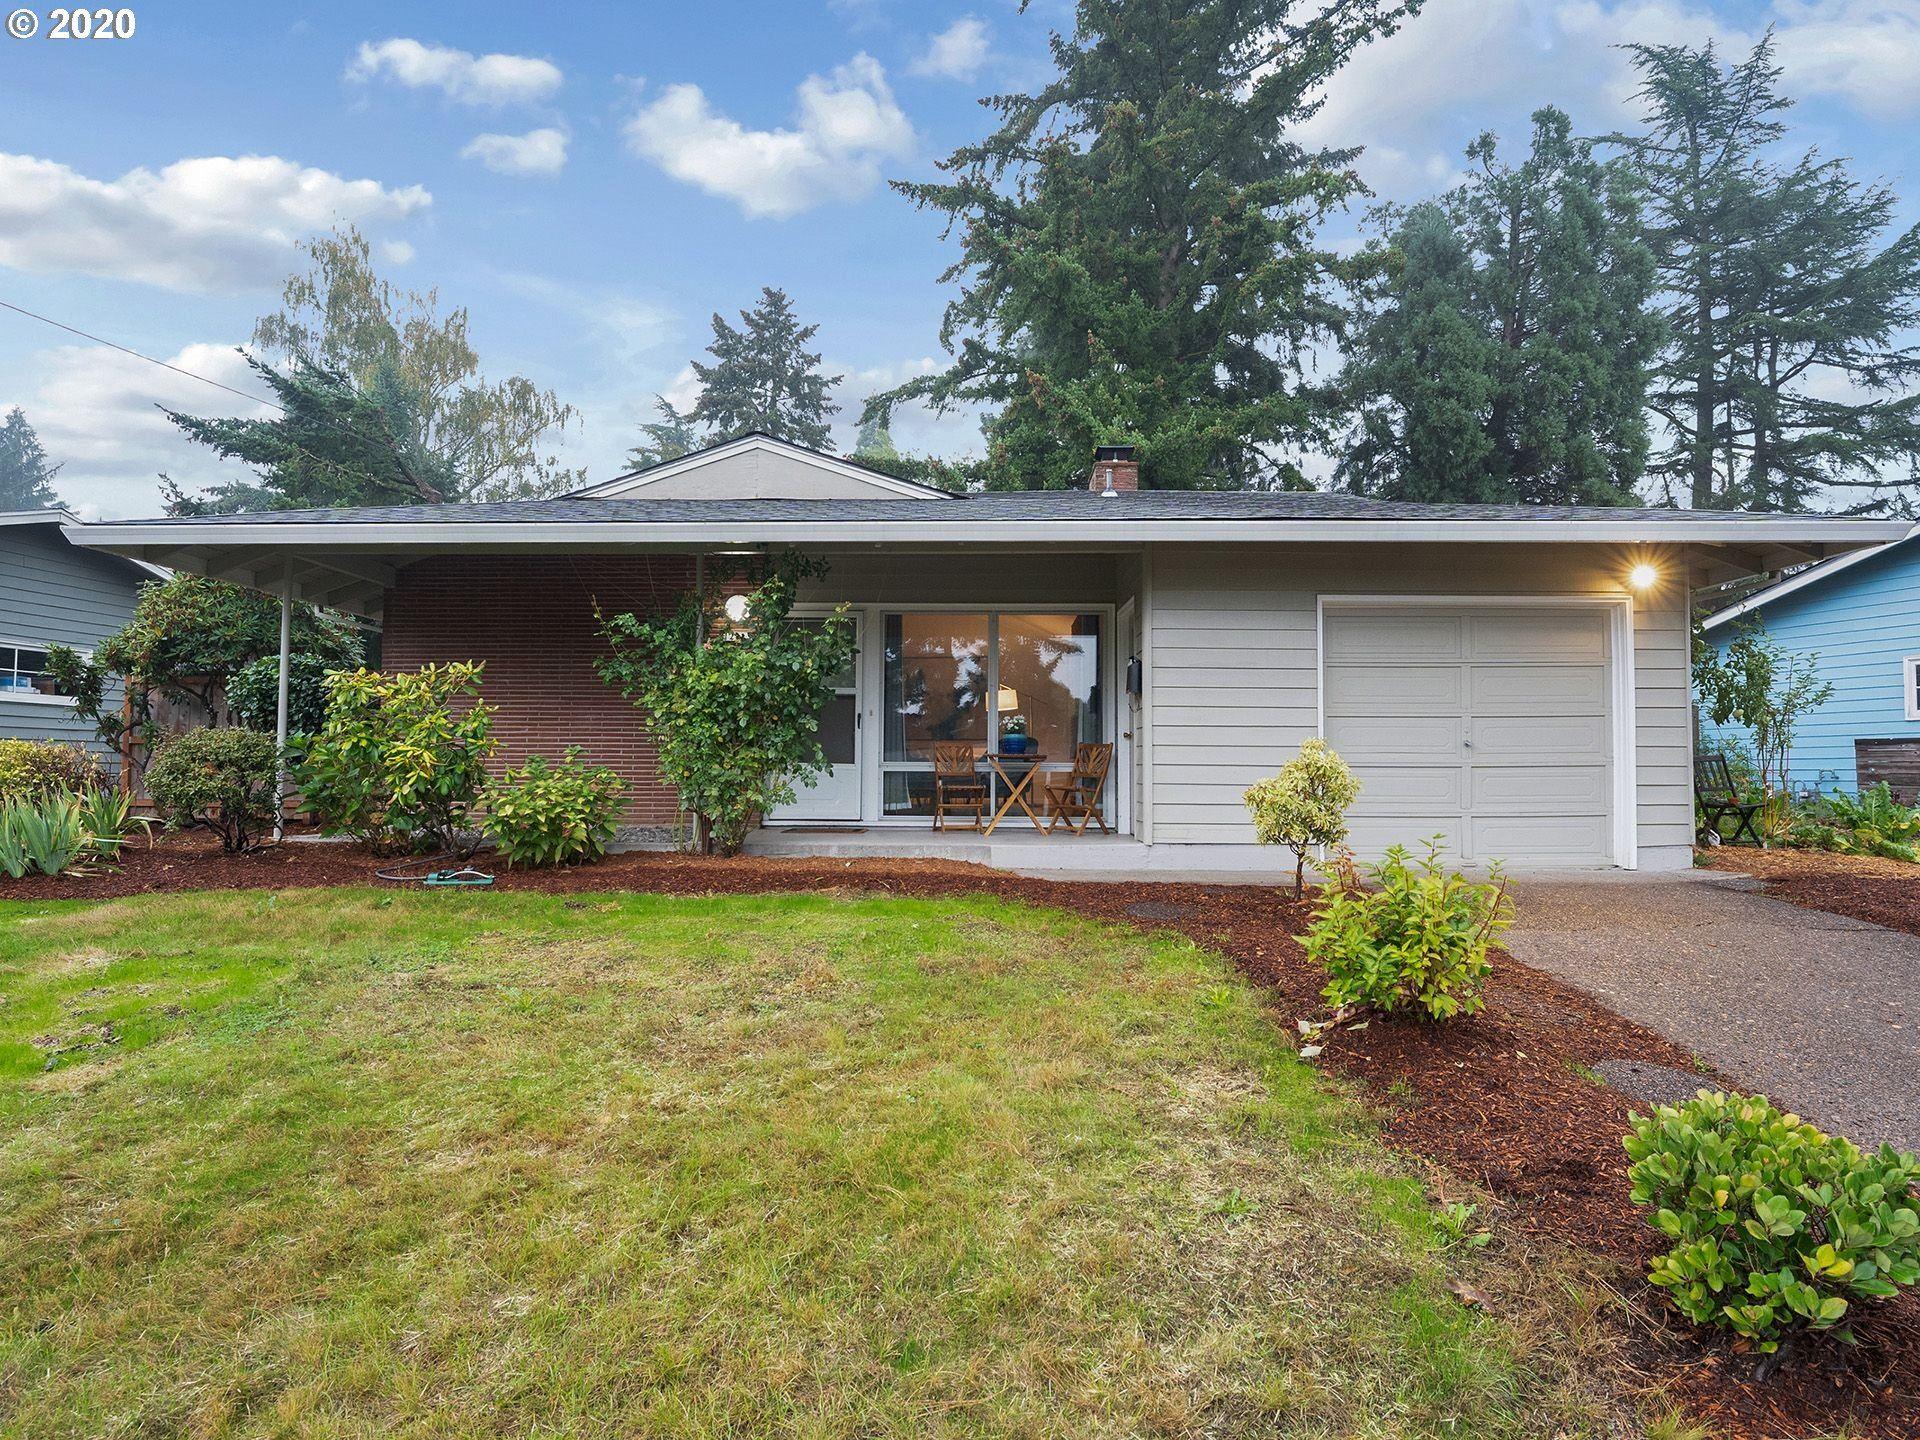 12615 SW FAIRCREST ST, Portland, OR 97225 - MLS#: 20660040